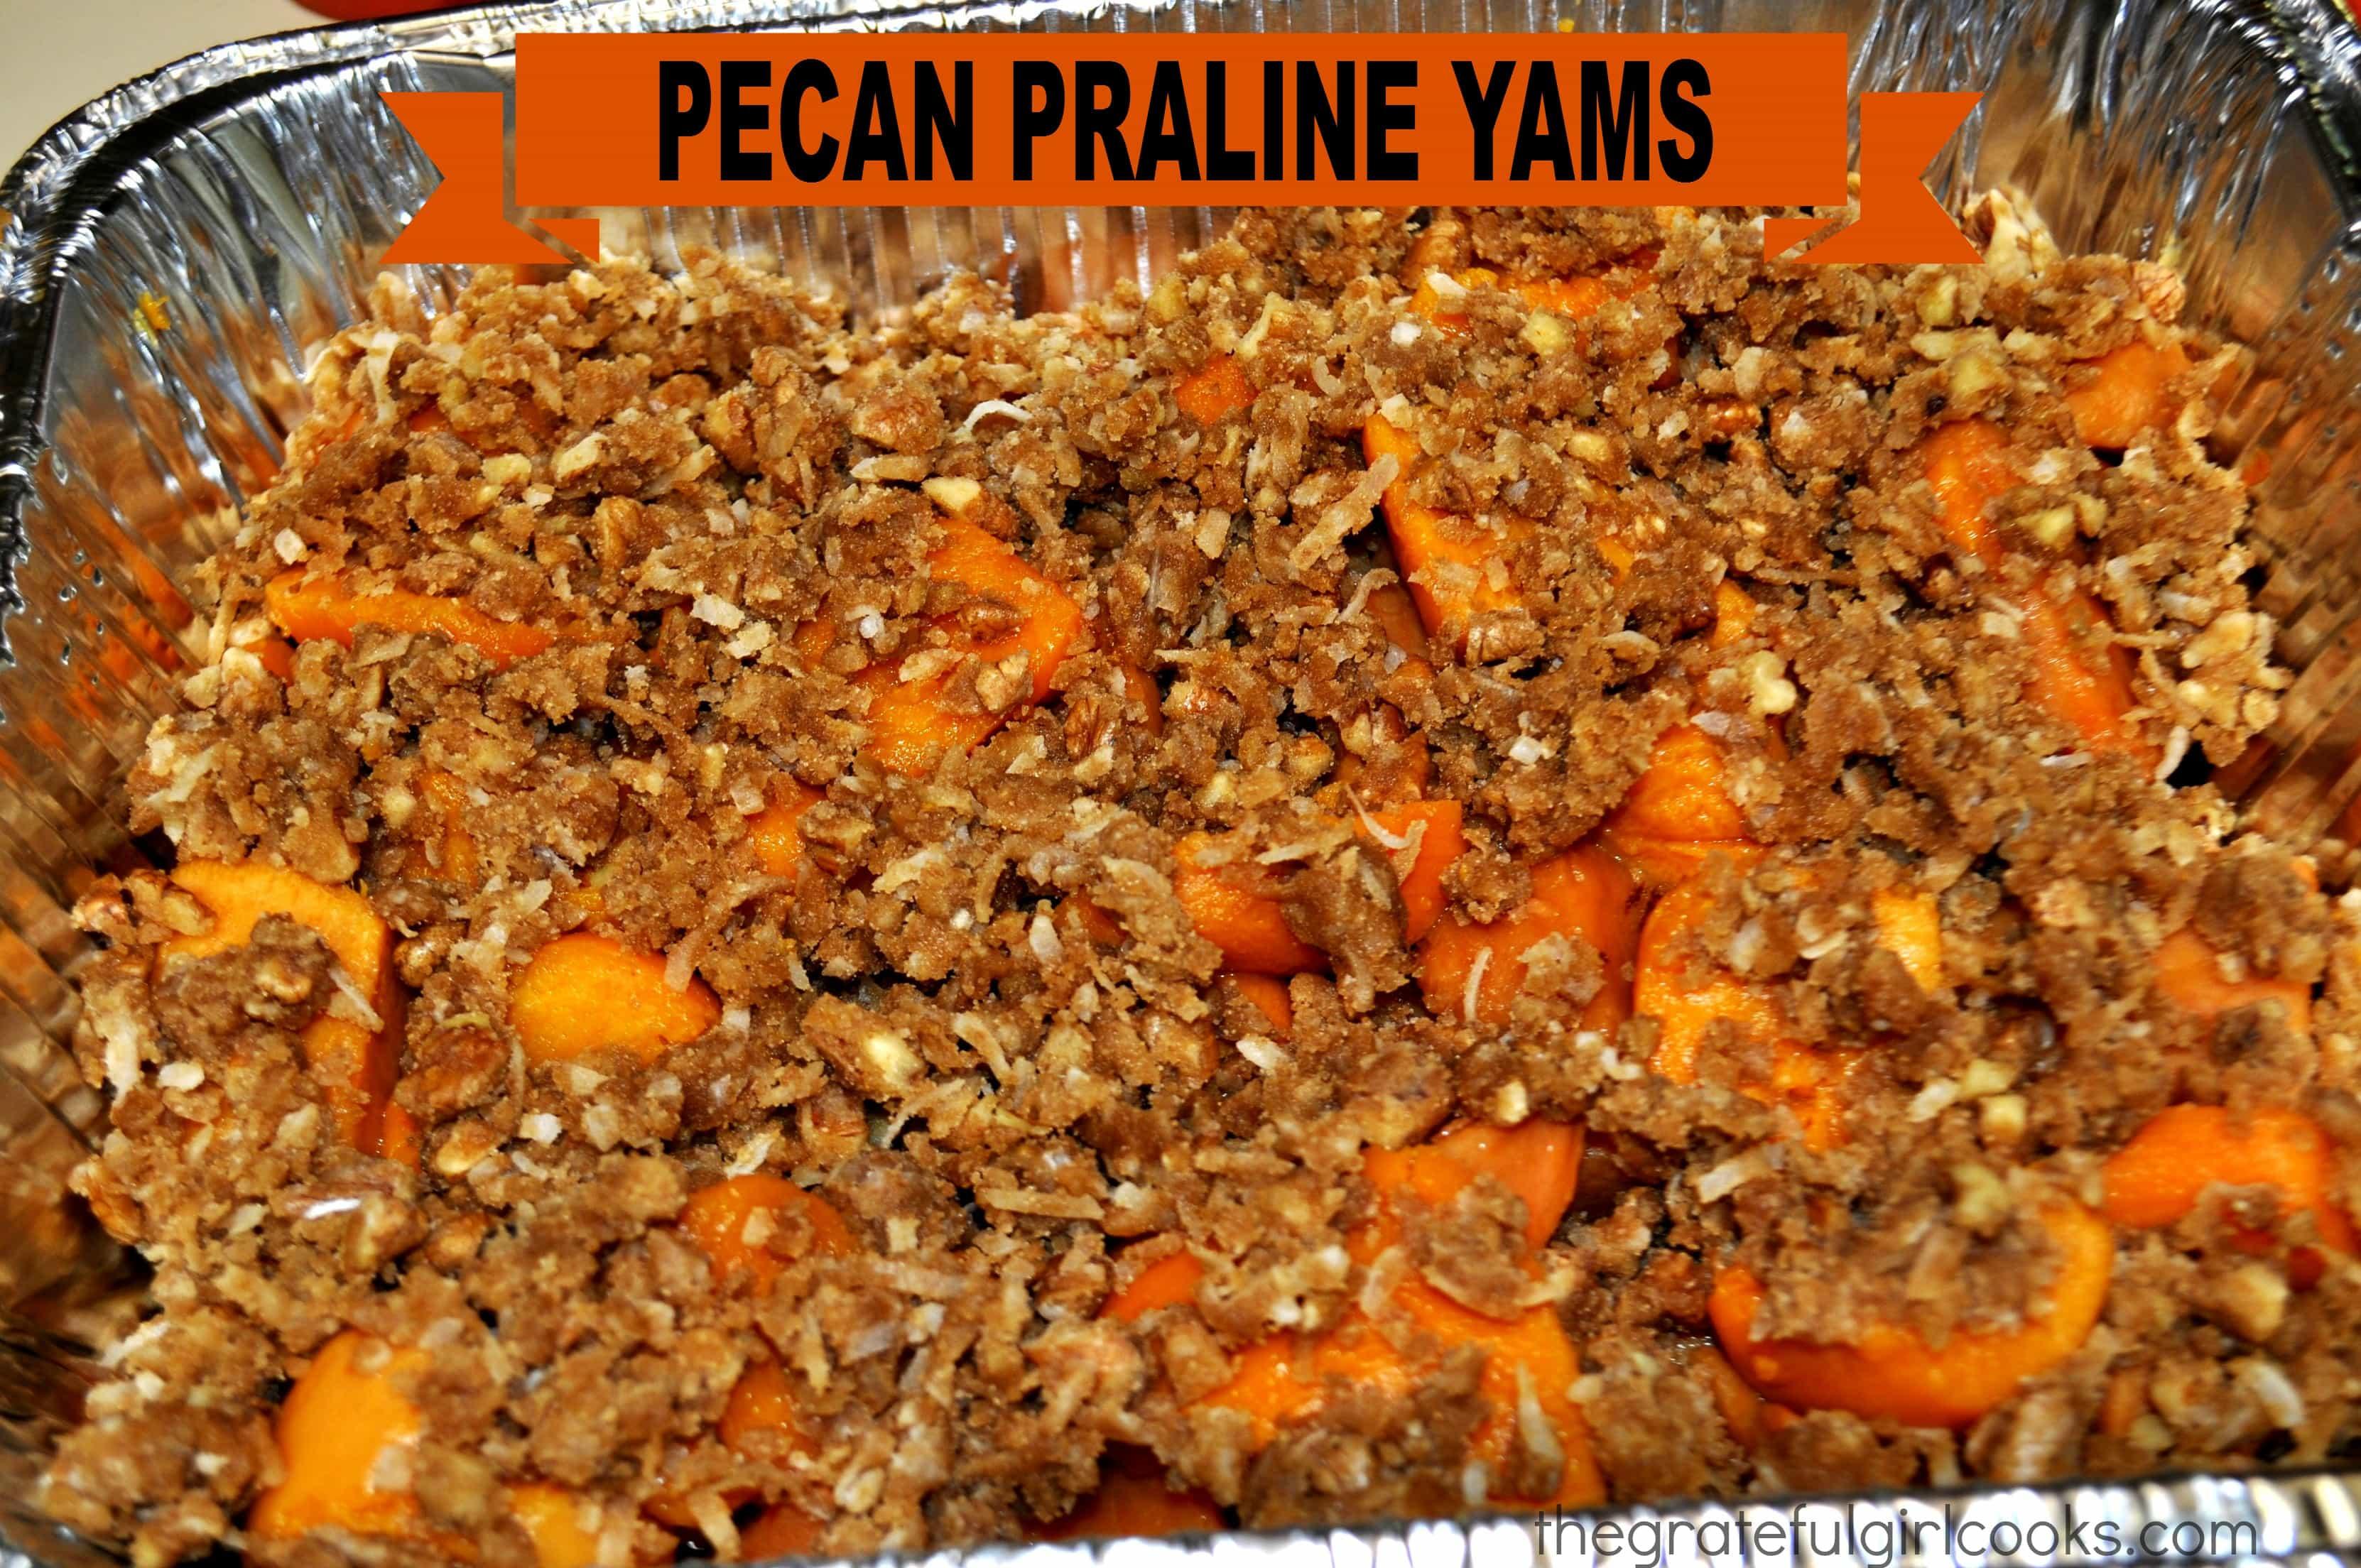 Pecan Praline Yams The Grateful Girl Cooks